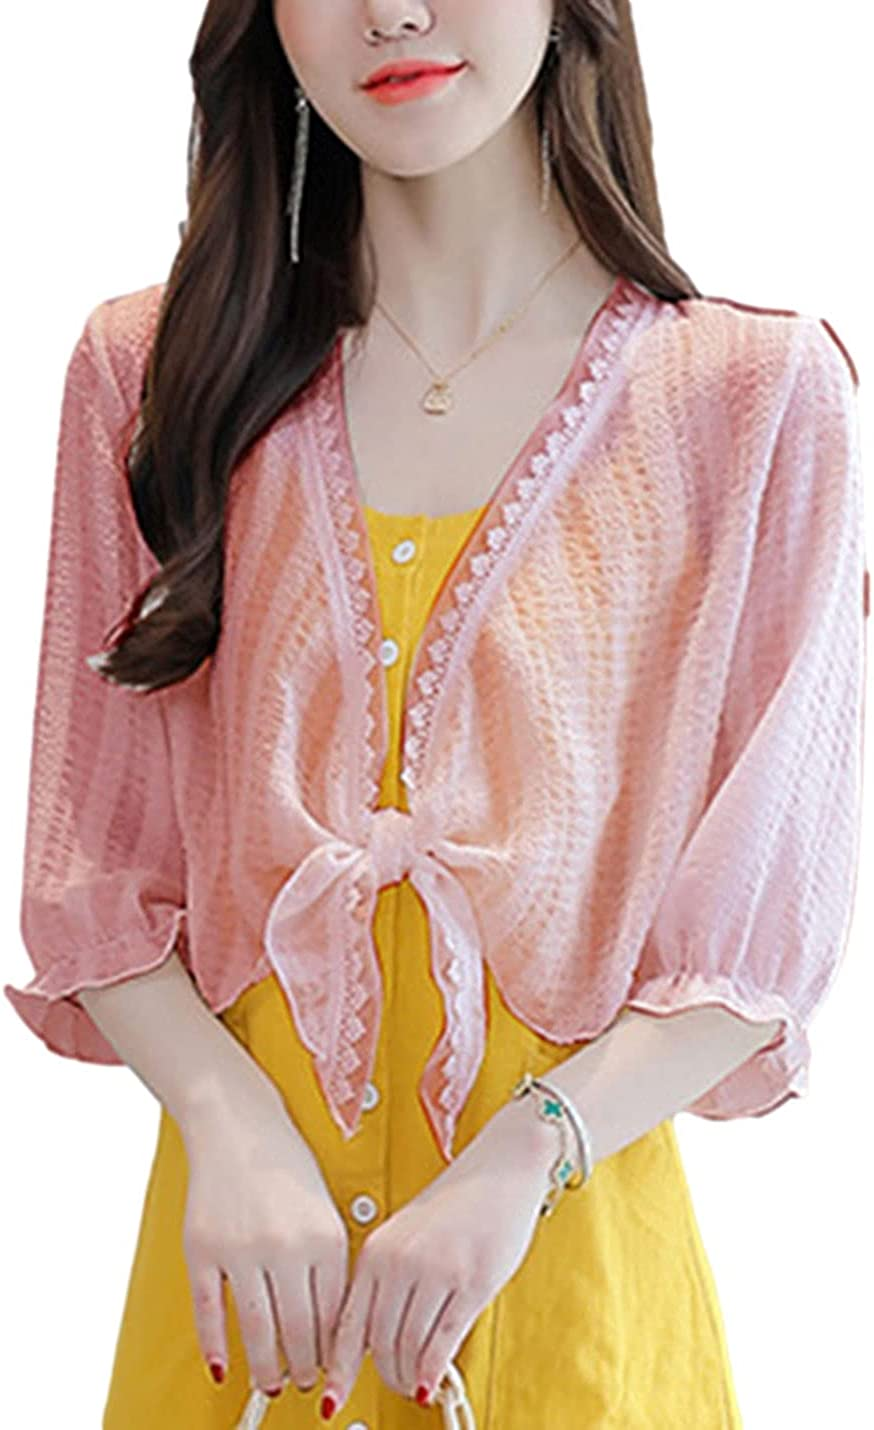 AMEBELLE Women's Lace Trim Tie Knot Open Front Cardigan 3/4 Sleeve Crop Shrug Tops